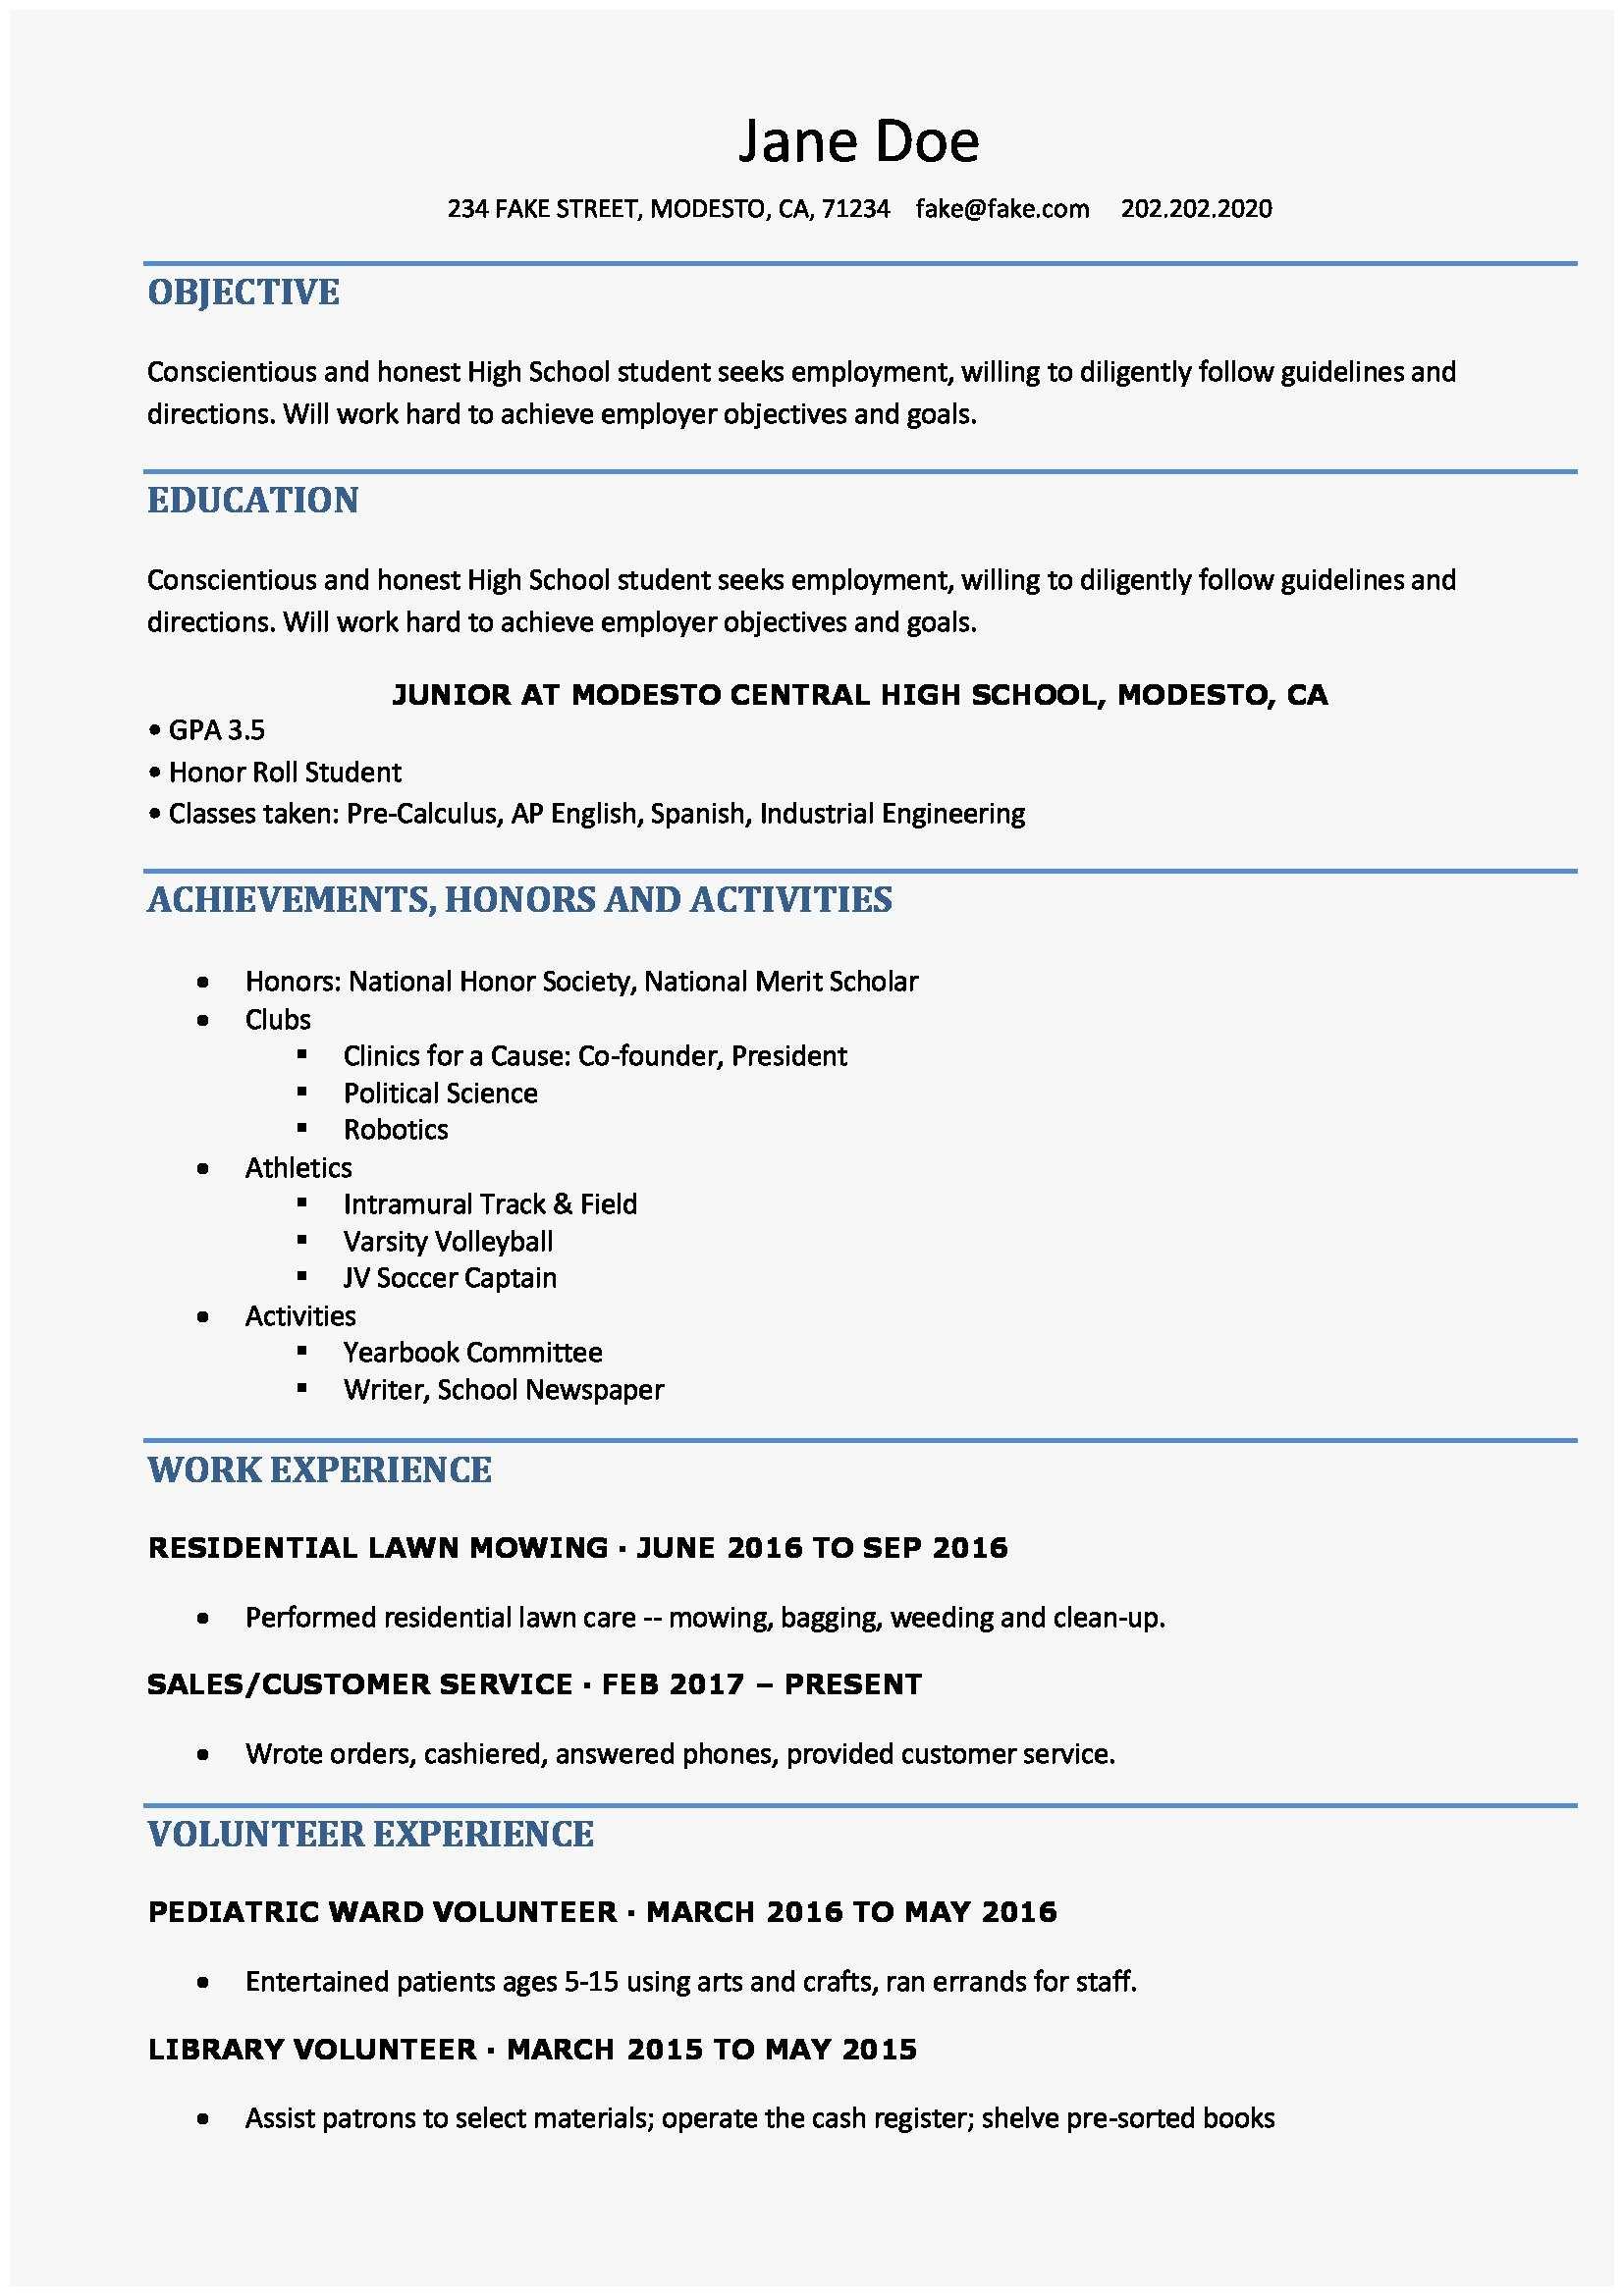 High School Resume High School Resume For College Cute High School Resume High School Resume Templates Of High School Resume For College high school resume|wikiresume.com